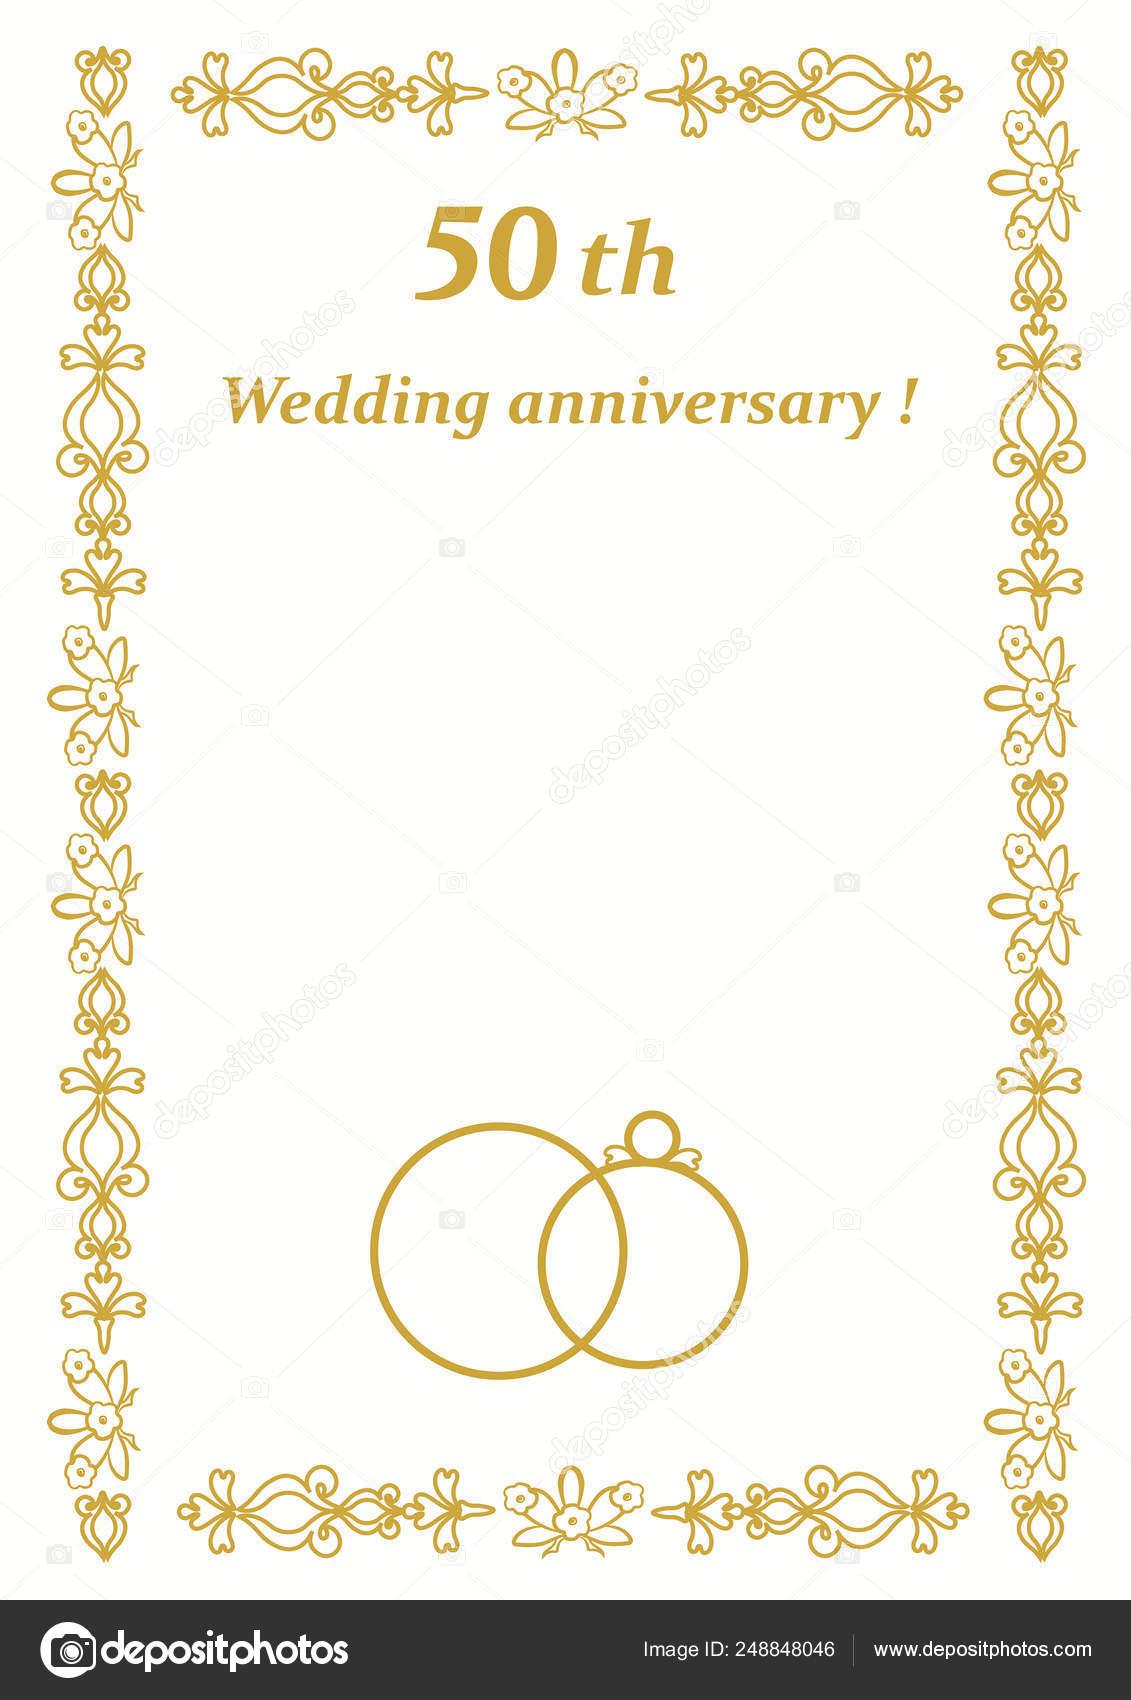 Golden Jubilee Wedding Anniversary Invitation Cards 50th